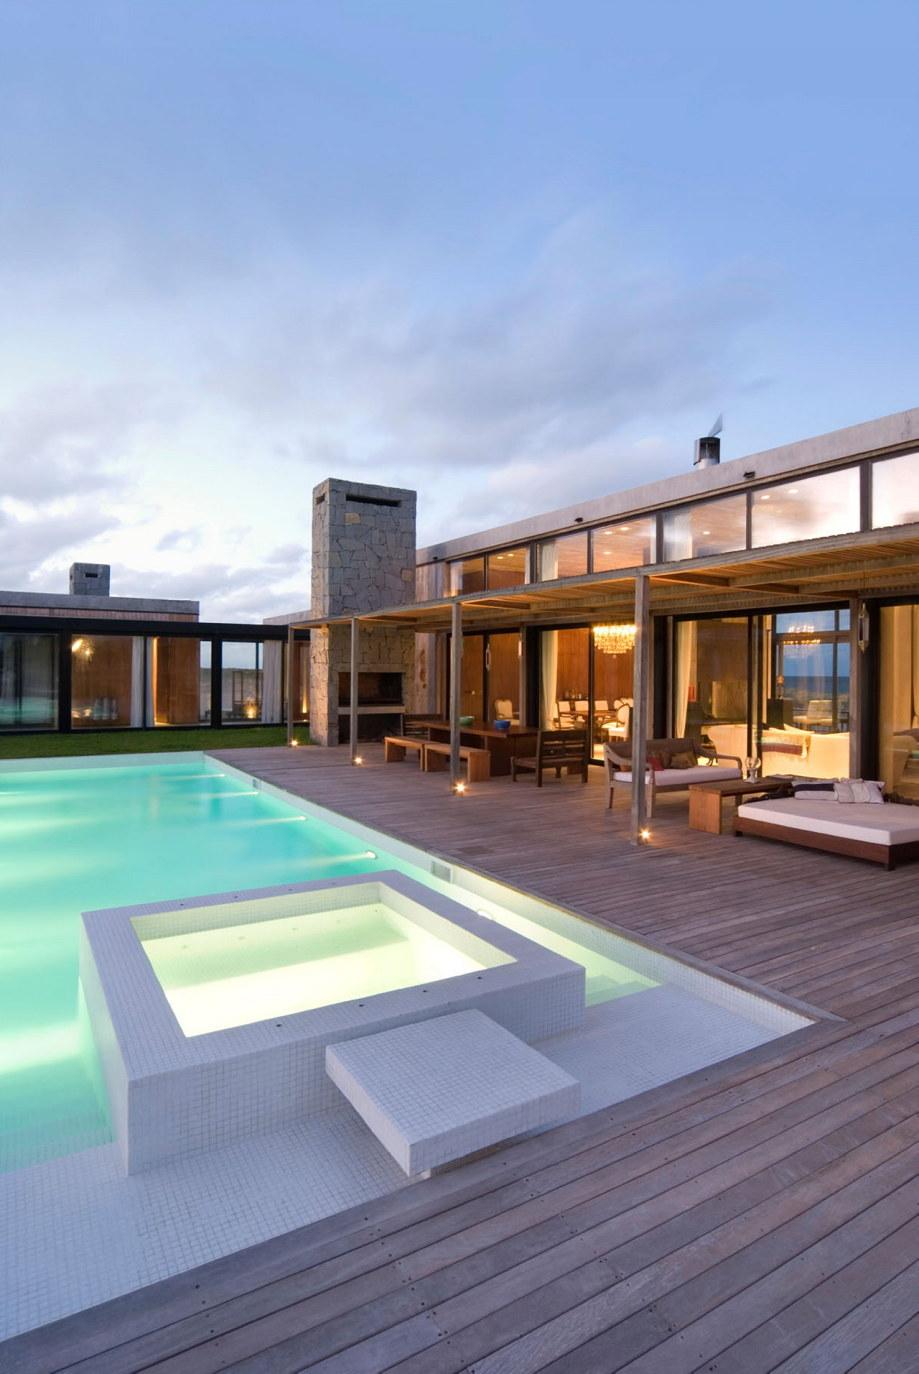 The beach house La Boyita Residence by Martin Gomez Arguitectos, Uruguay 32